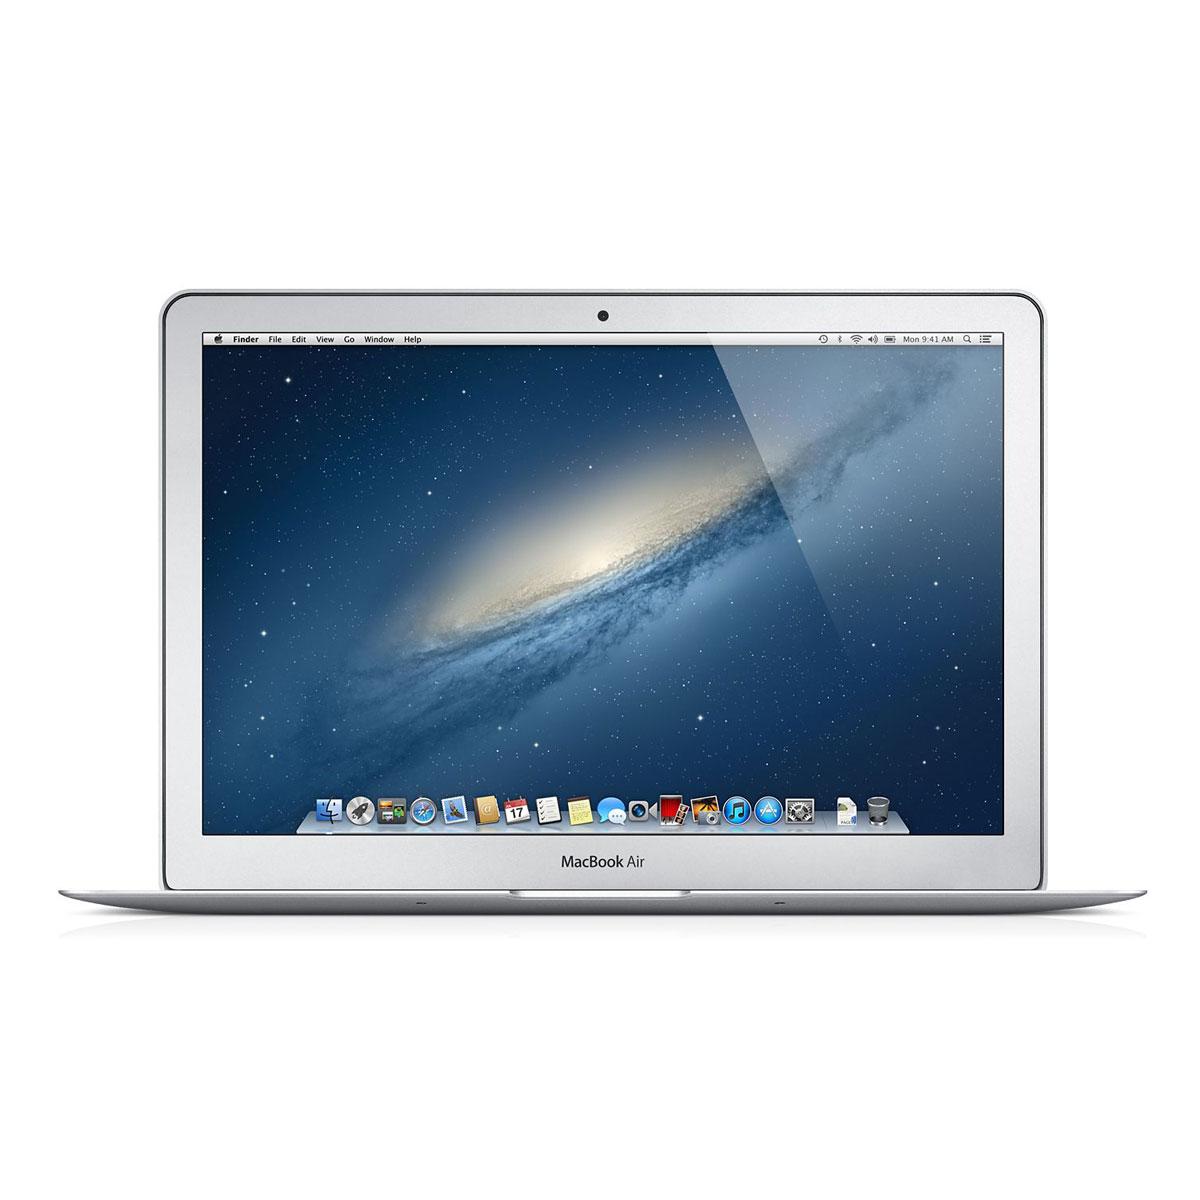 apple macbook air 13 md231f a macbook apple sur. Black Bedroom Furniture Sets. Home Design Ideas